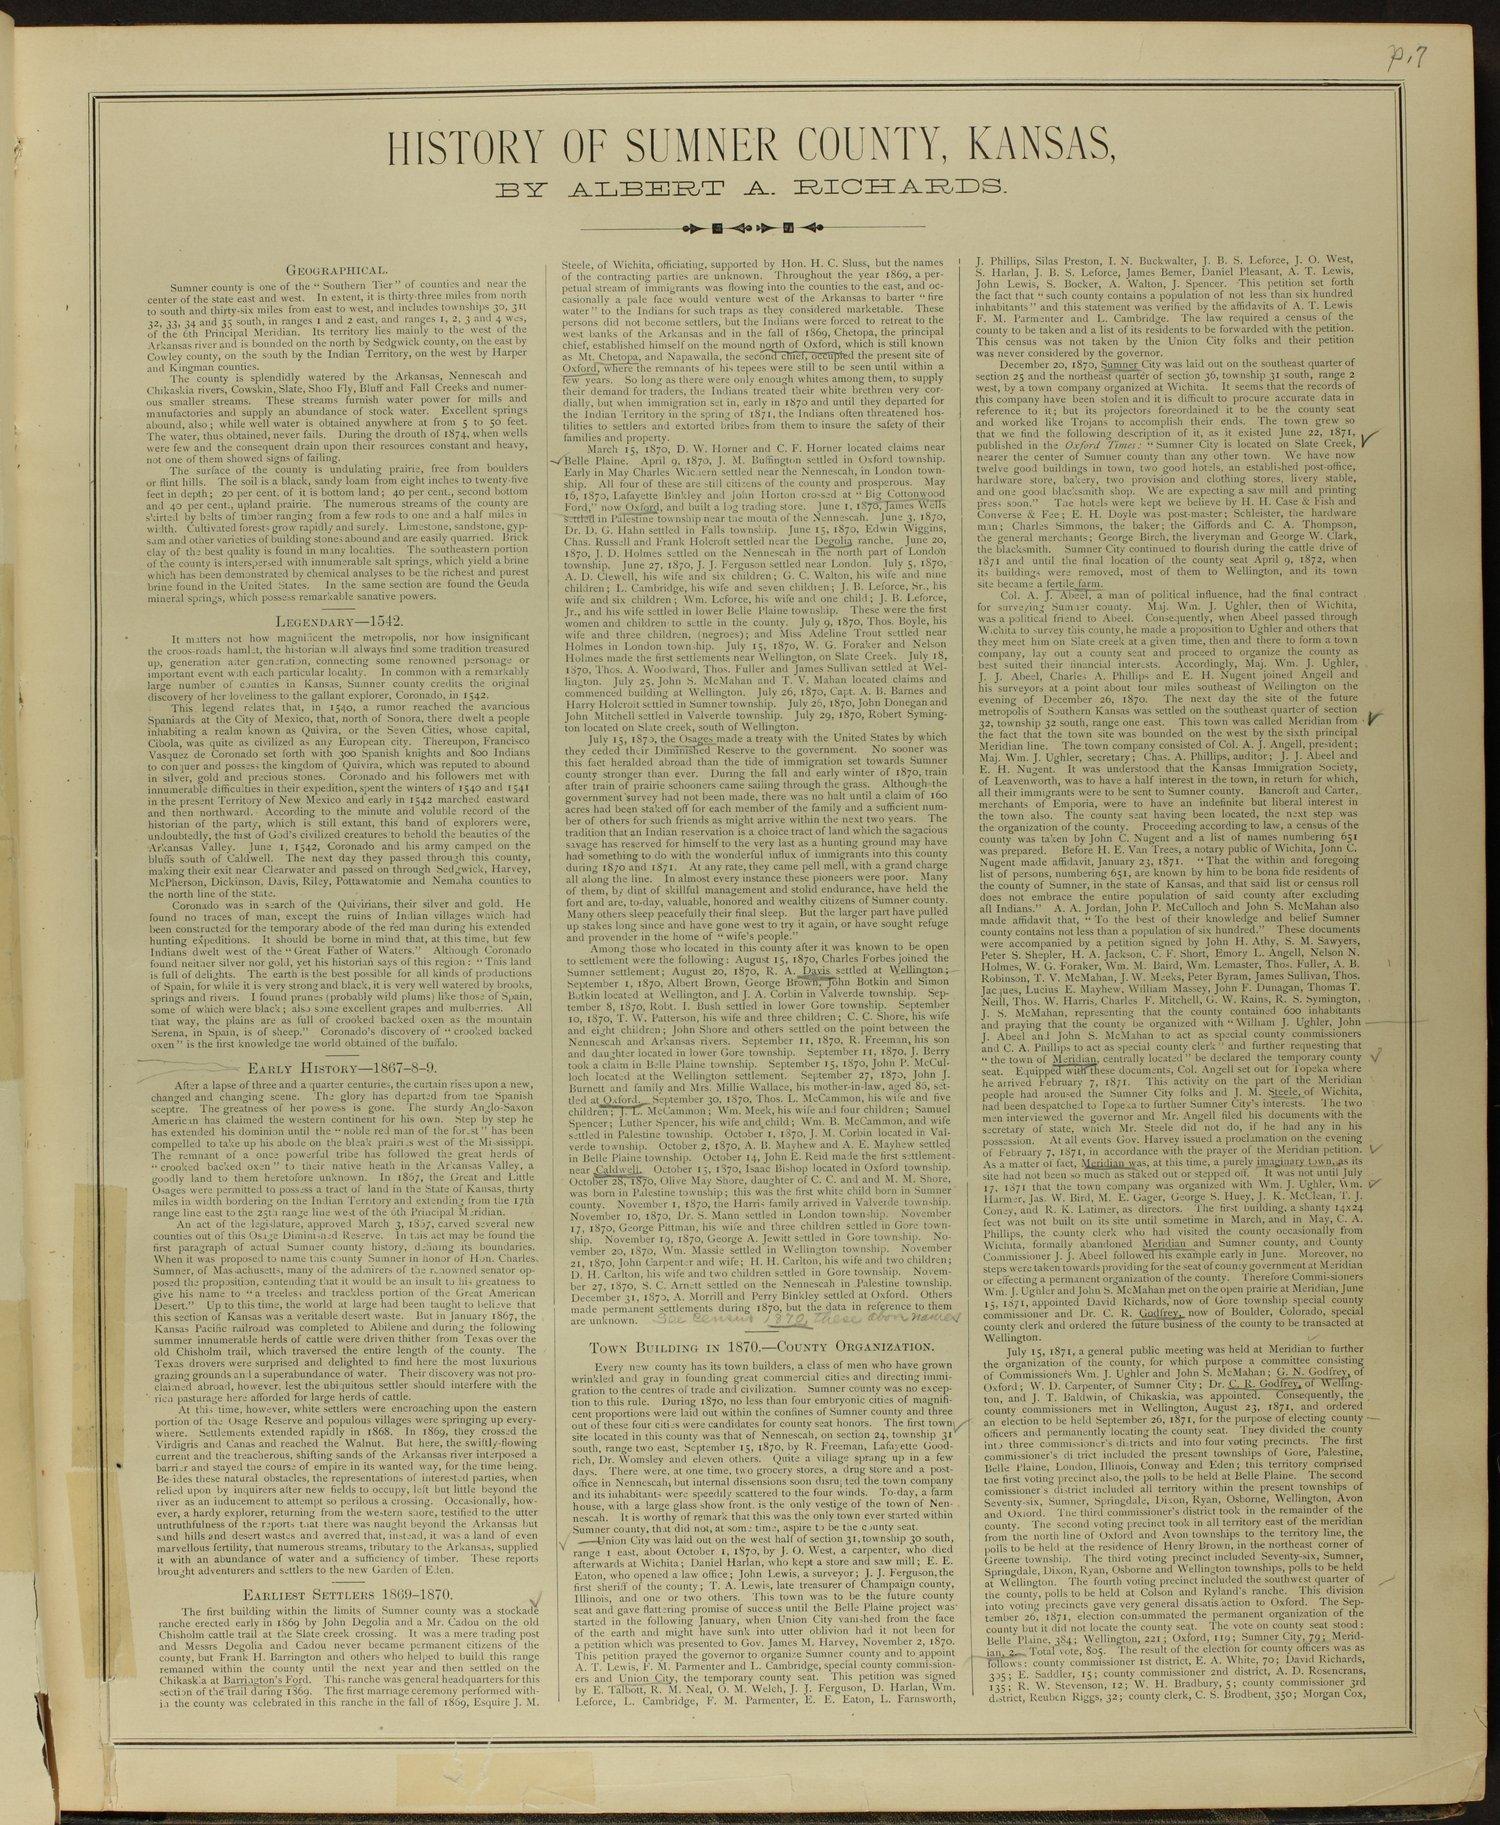 Historical atlas of Sumner County, Kansas - 7